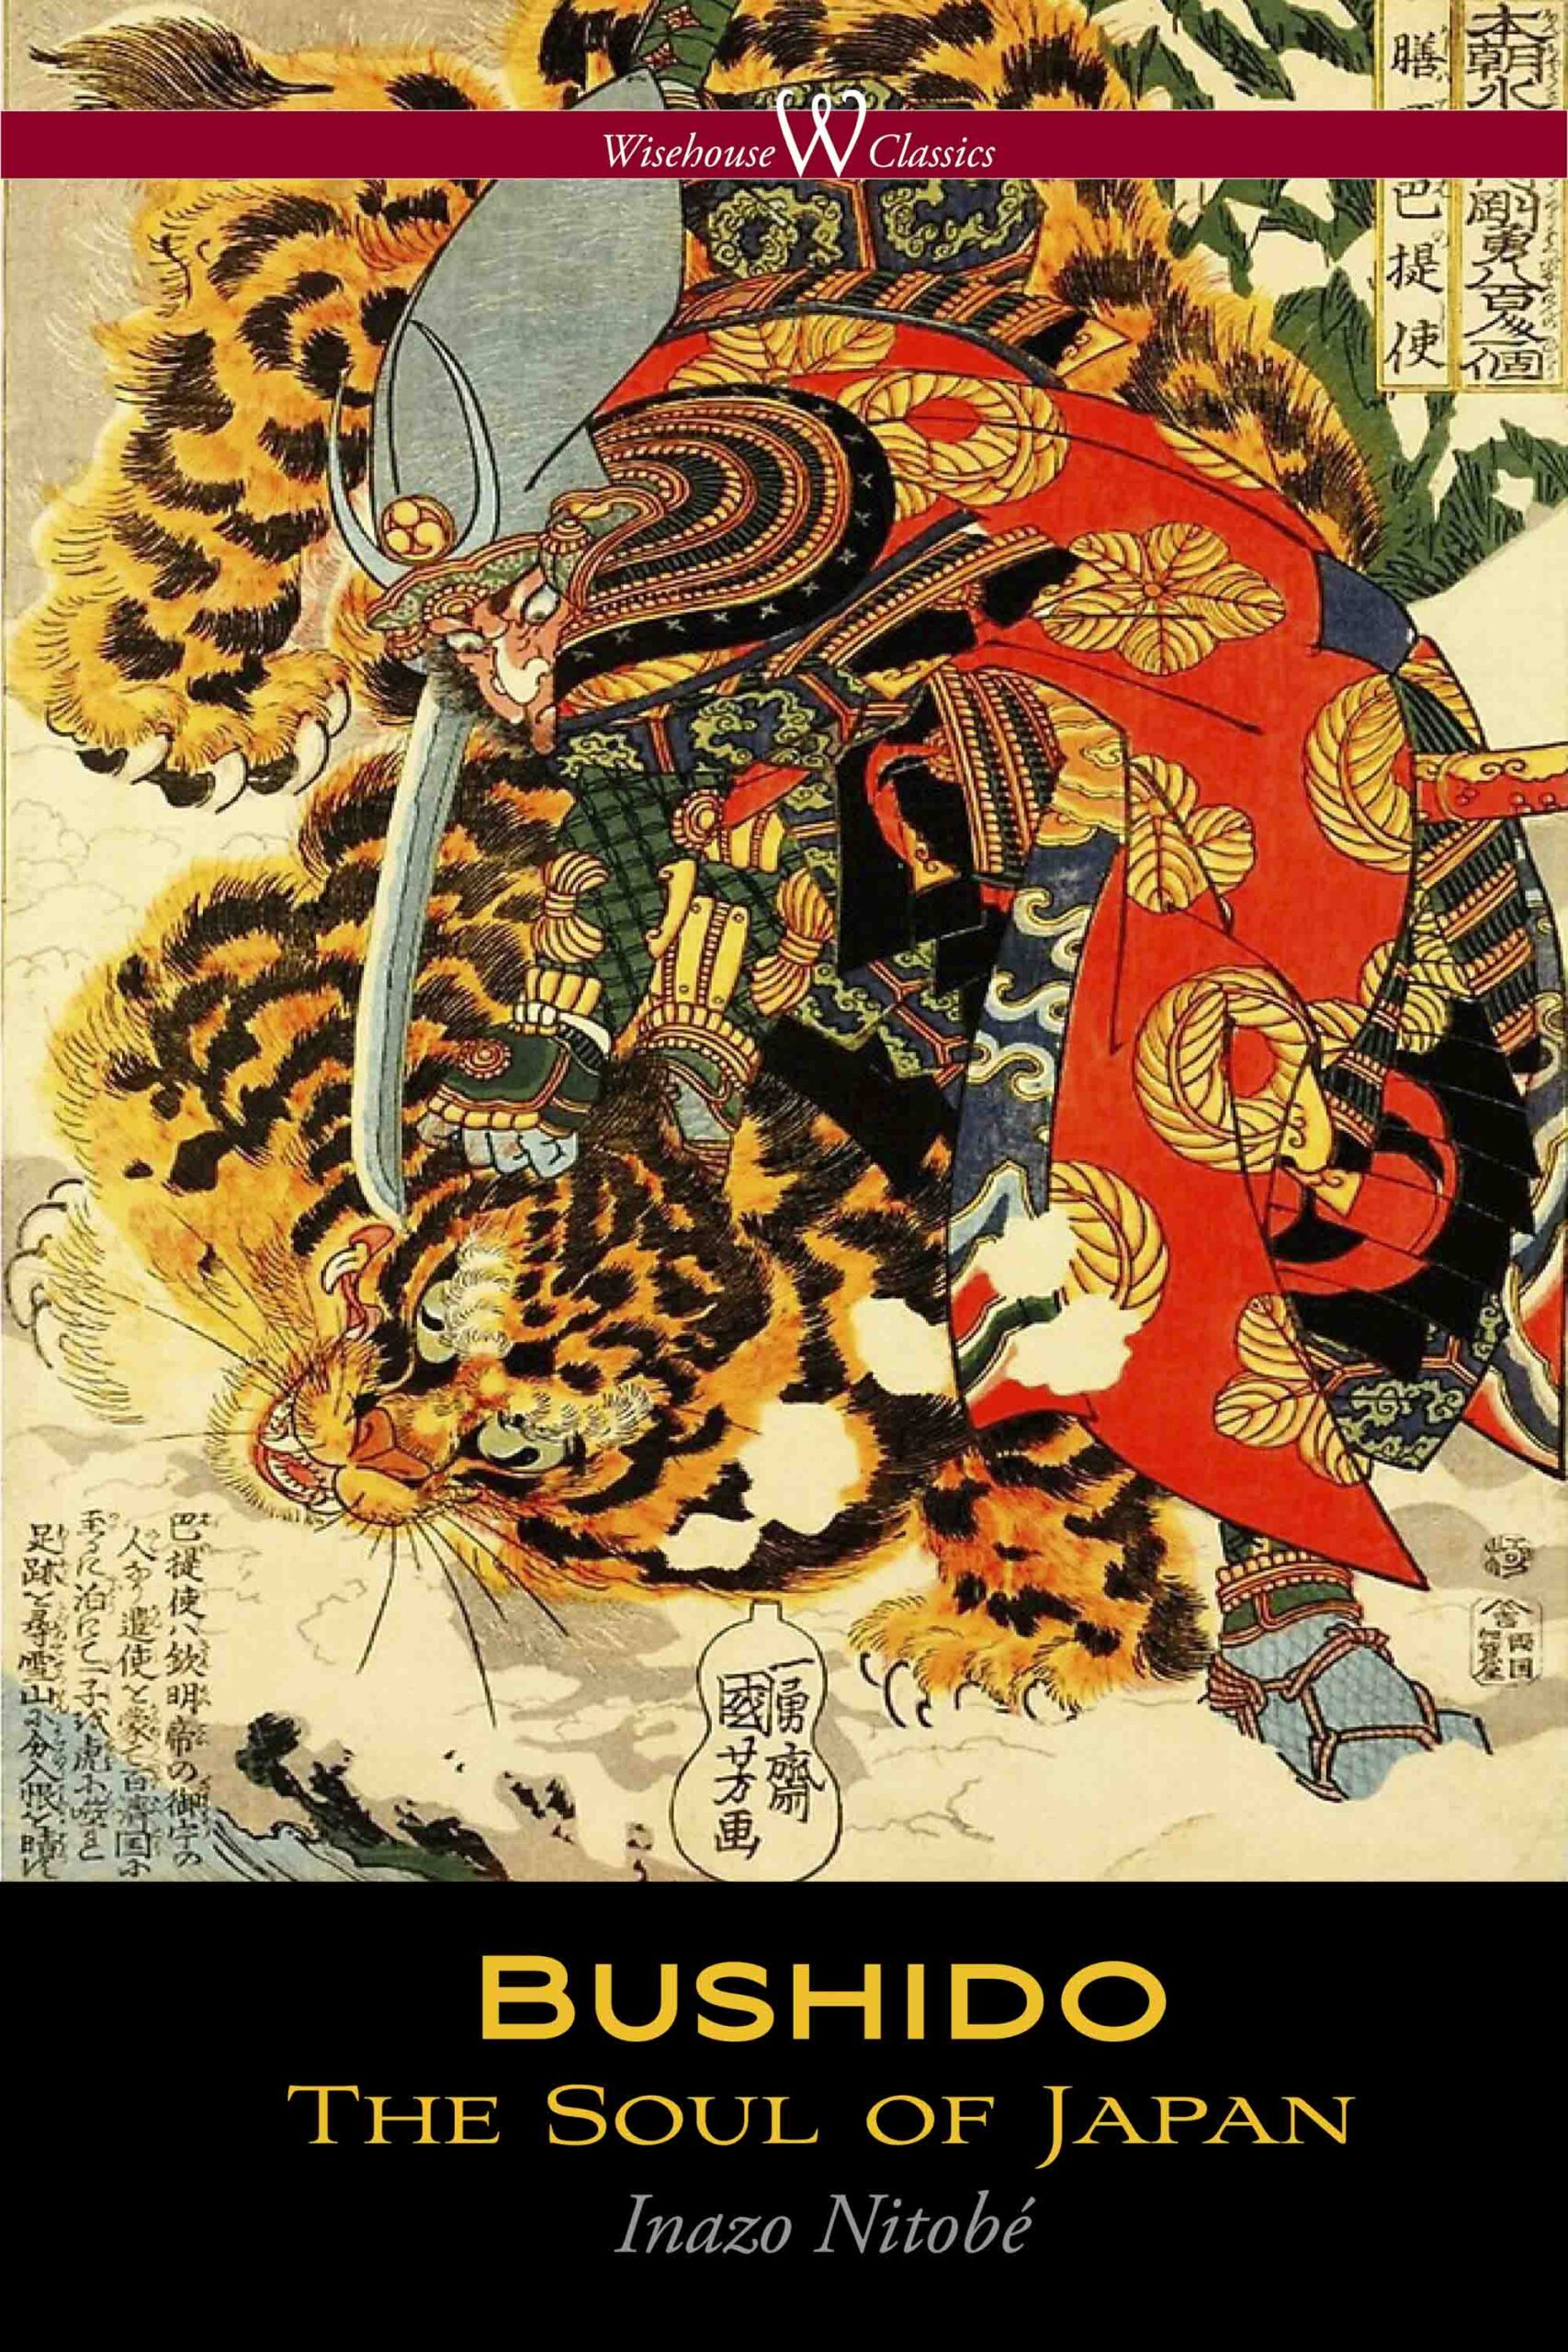 Bushido: The Soul of Japan (Wisehouse Classics Edition)